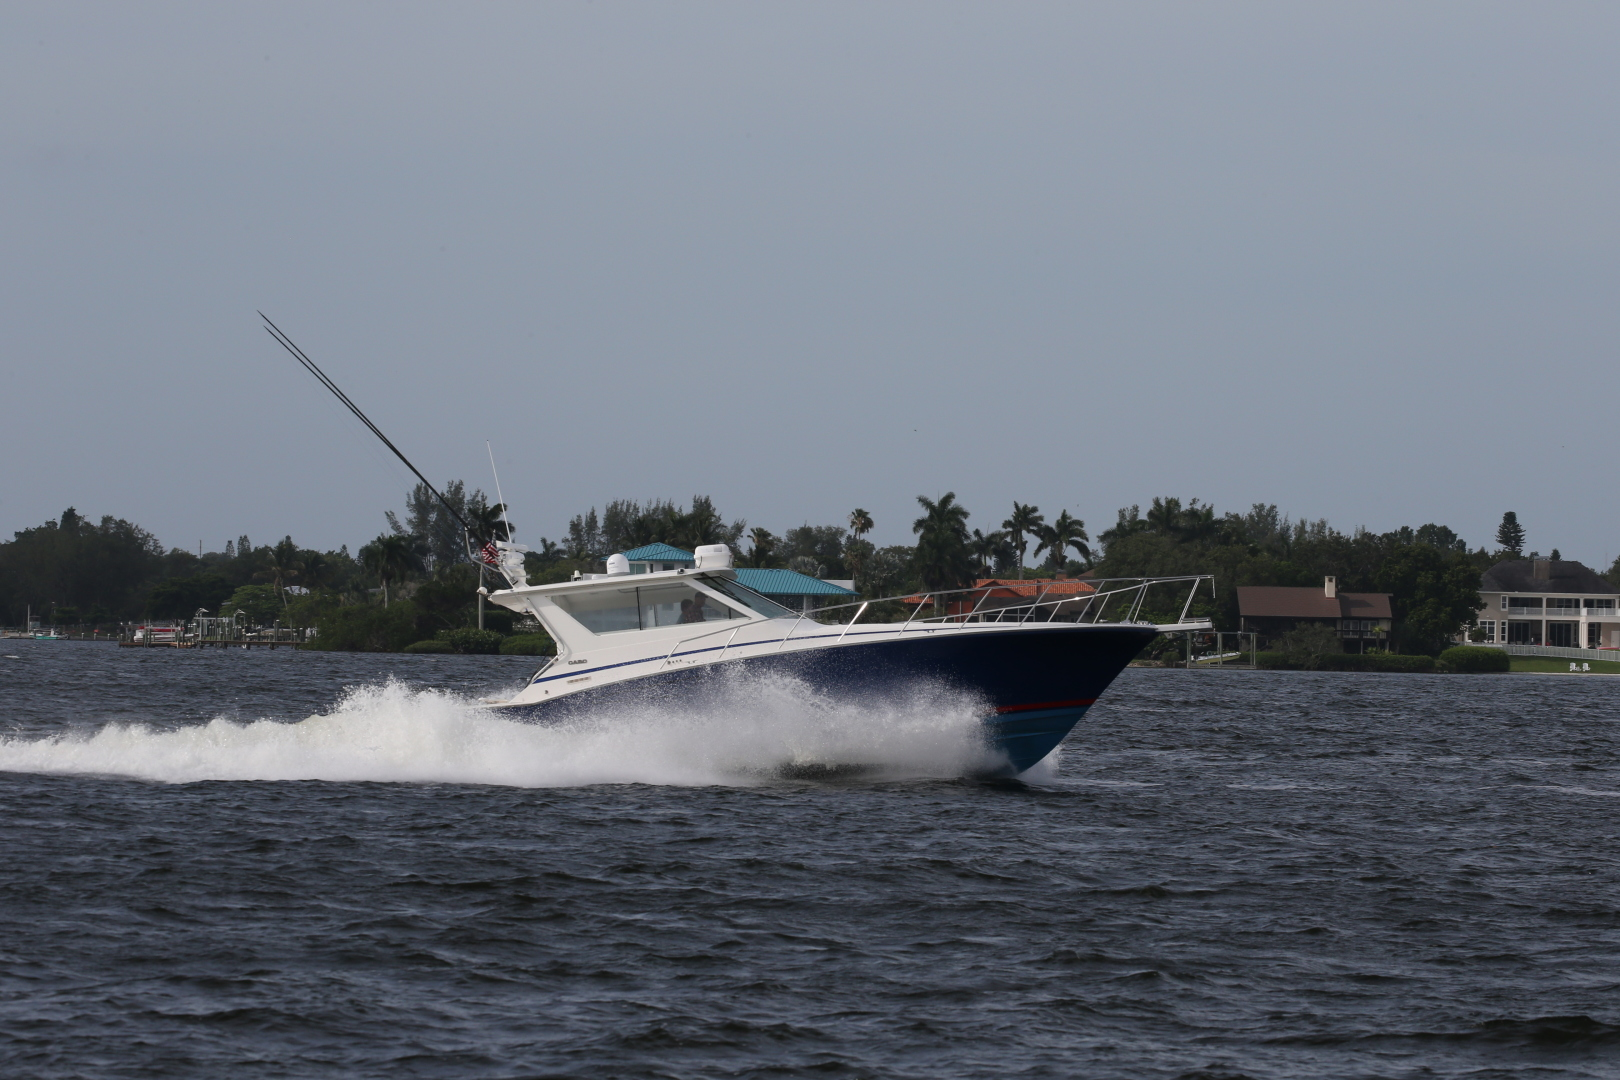 Cabo-45 Express 1997-Reel Life Panama City Beach-Florida-United States-45 Cabo Express-1369524   Thumbnail